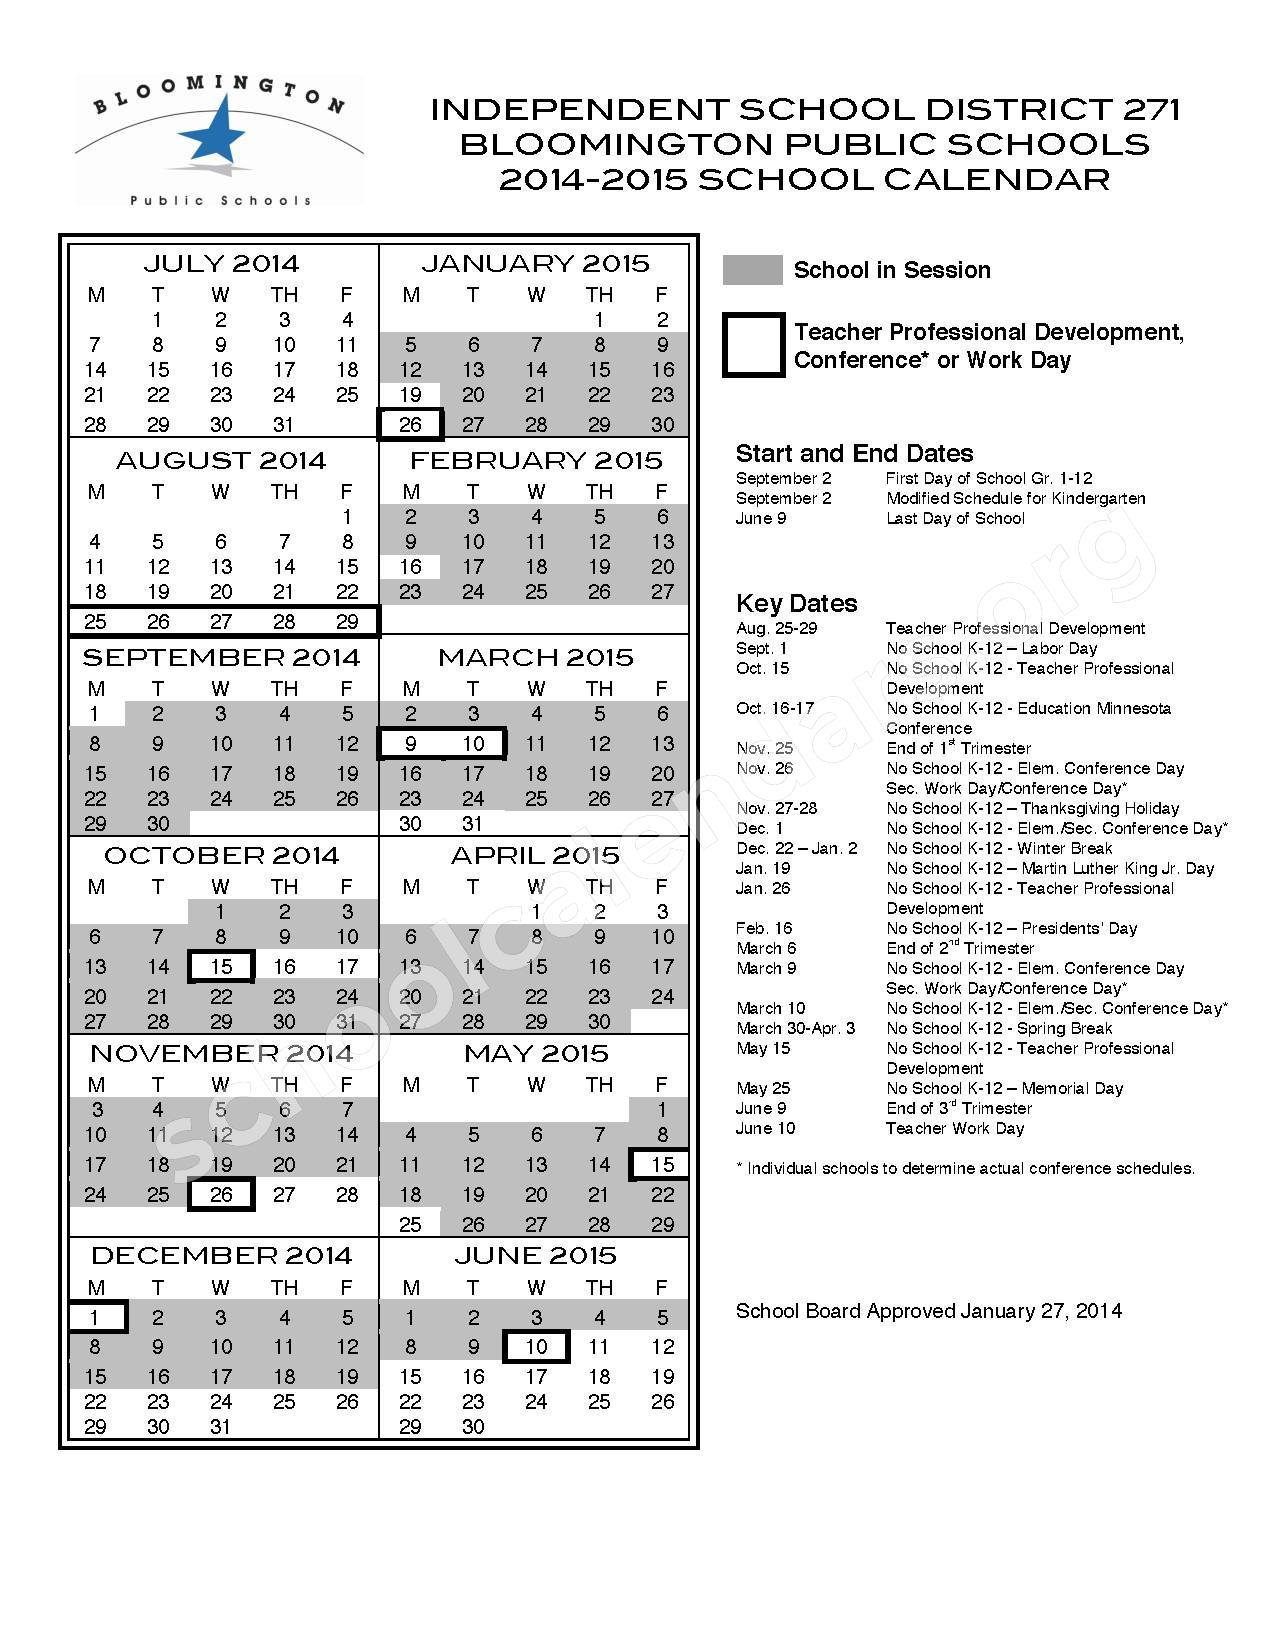 Full Year Calendar One Page : Full year calendar detail